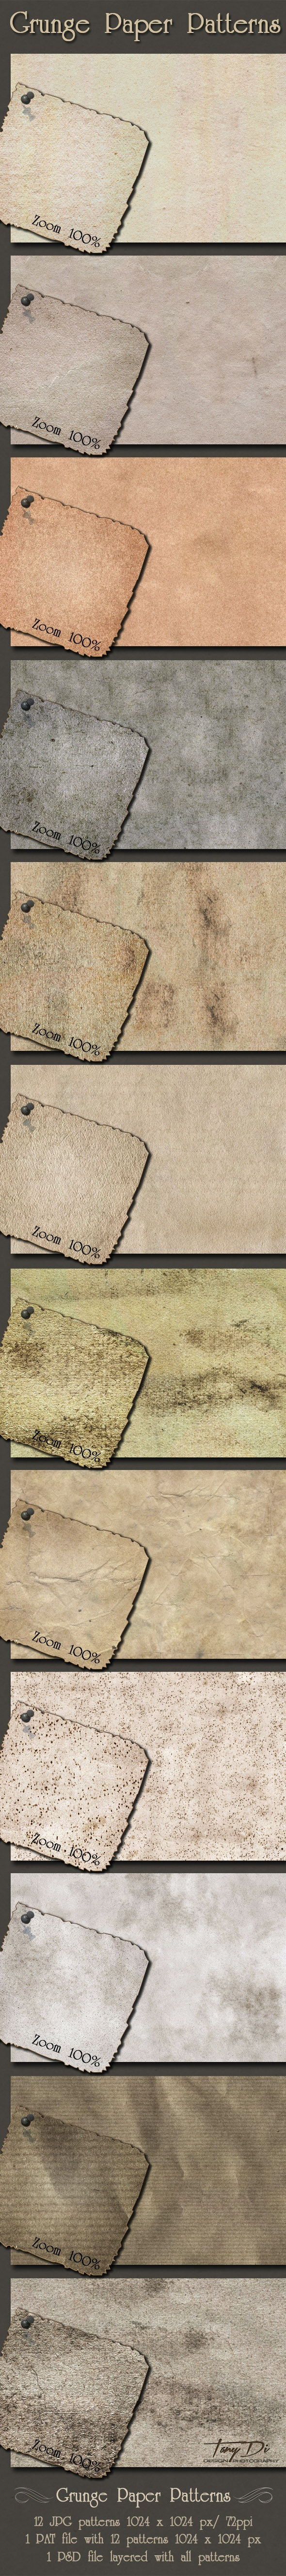 Grunge Paper Patterns - Miscellaneous Textures / Fills / Patterns